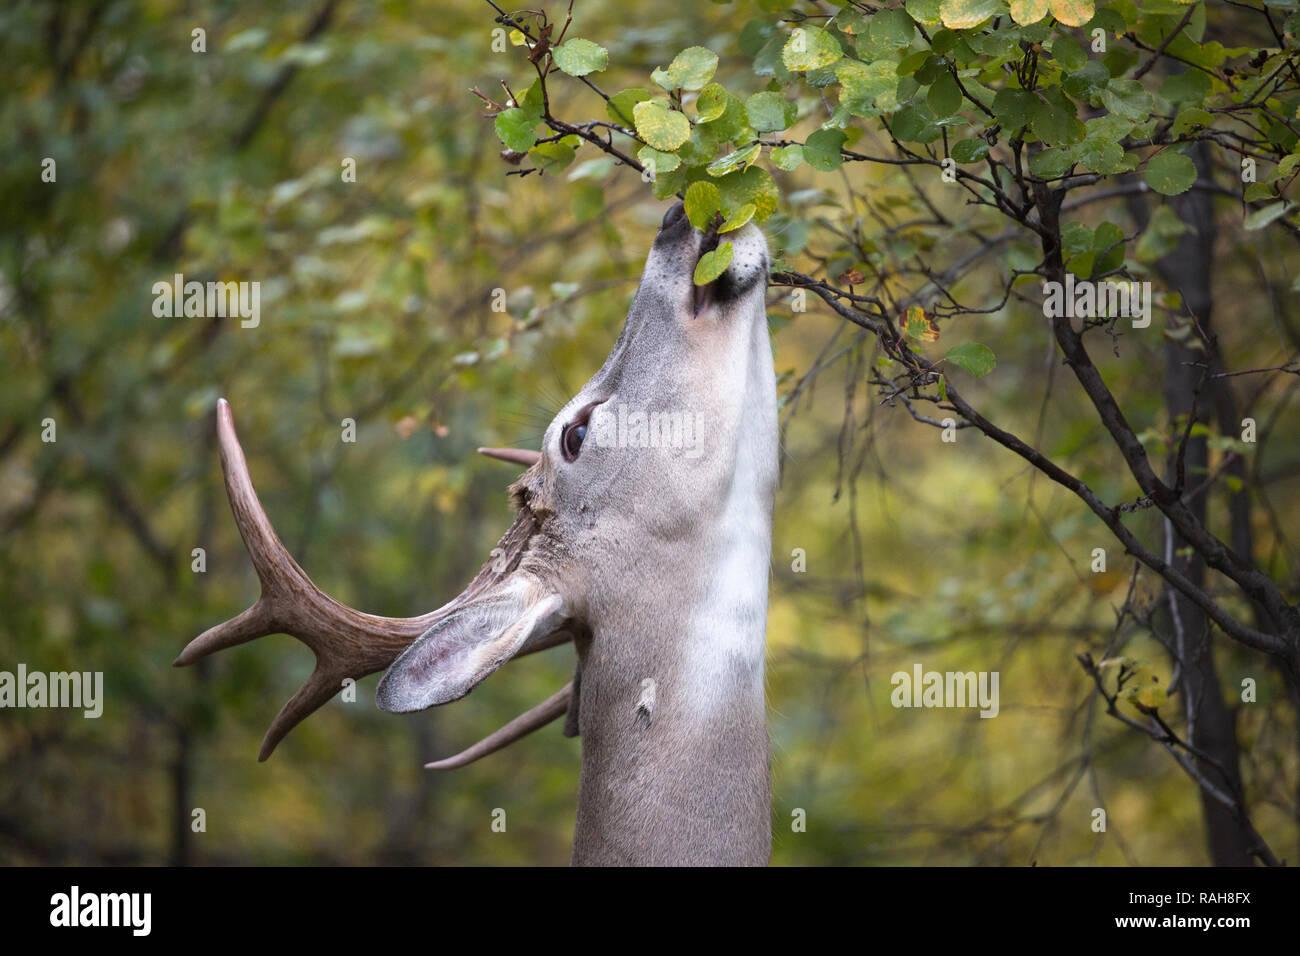 White-tailed Deer buck (Odocoileus virginianus) feeding on Saskatoon Berry shrub (Amelanchier alnifolia) Stock Photo